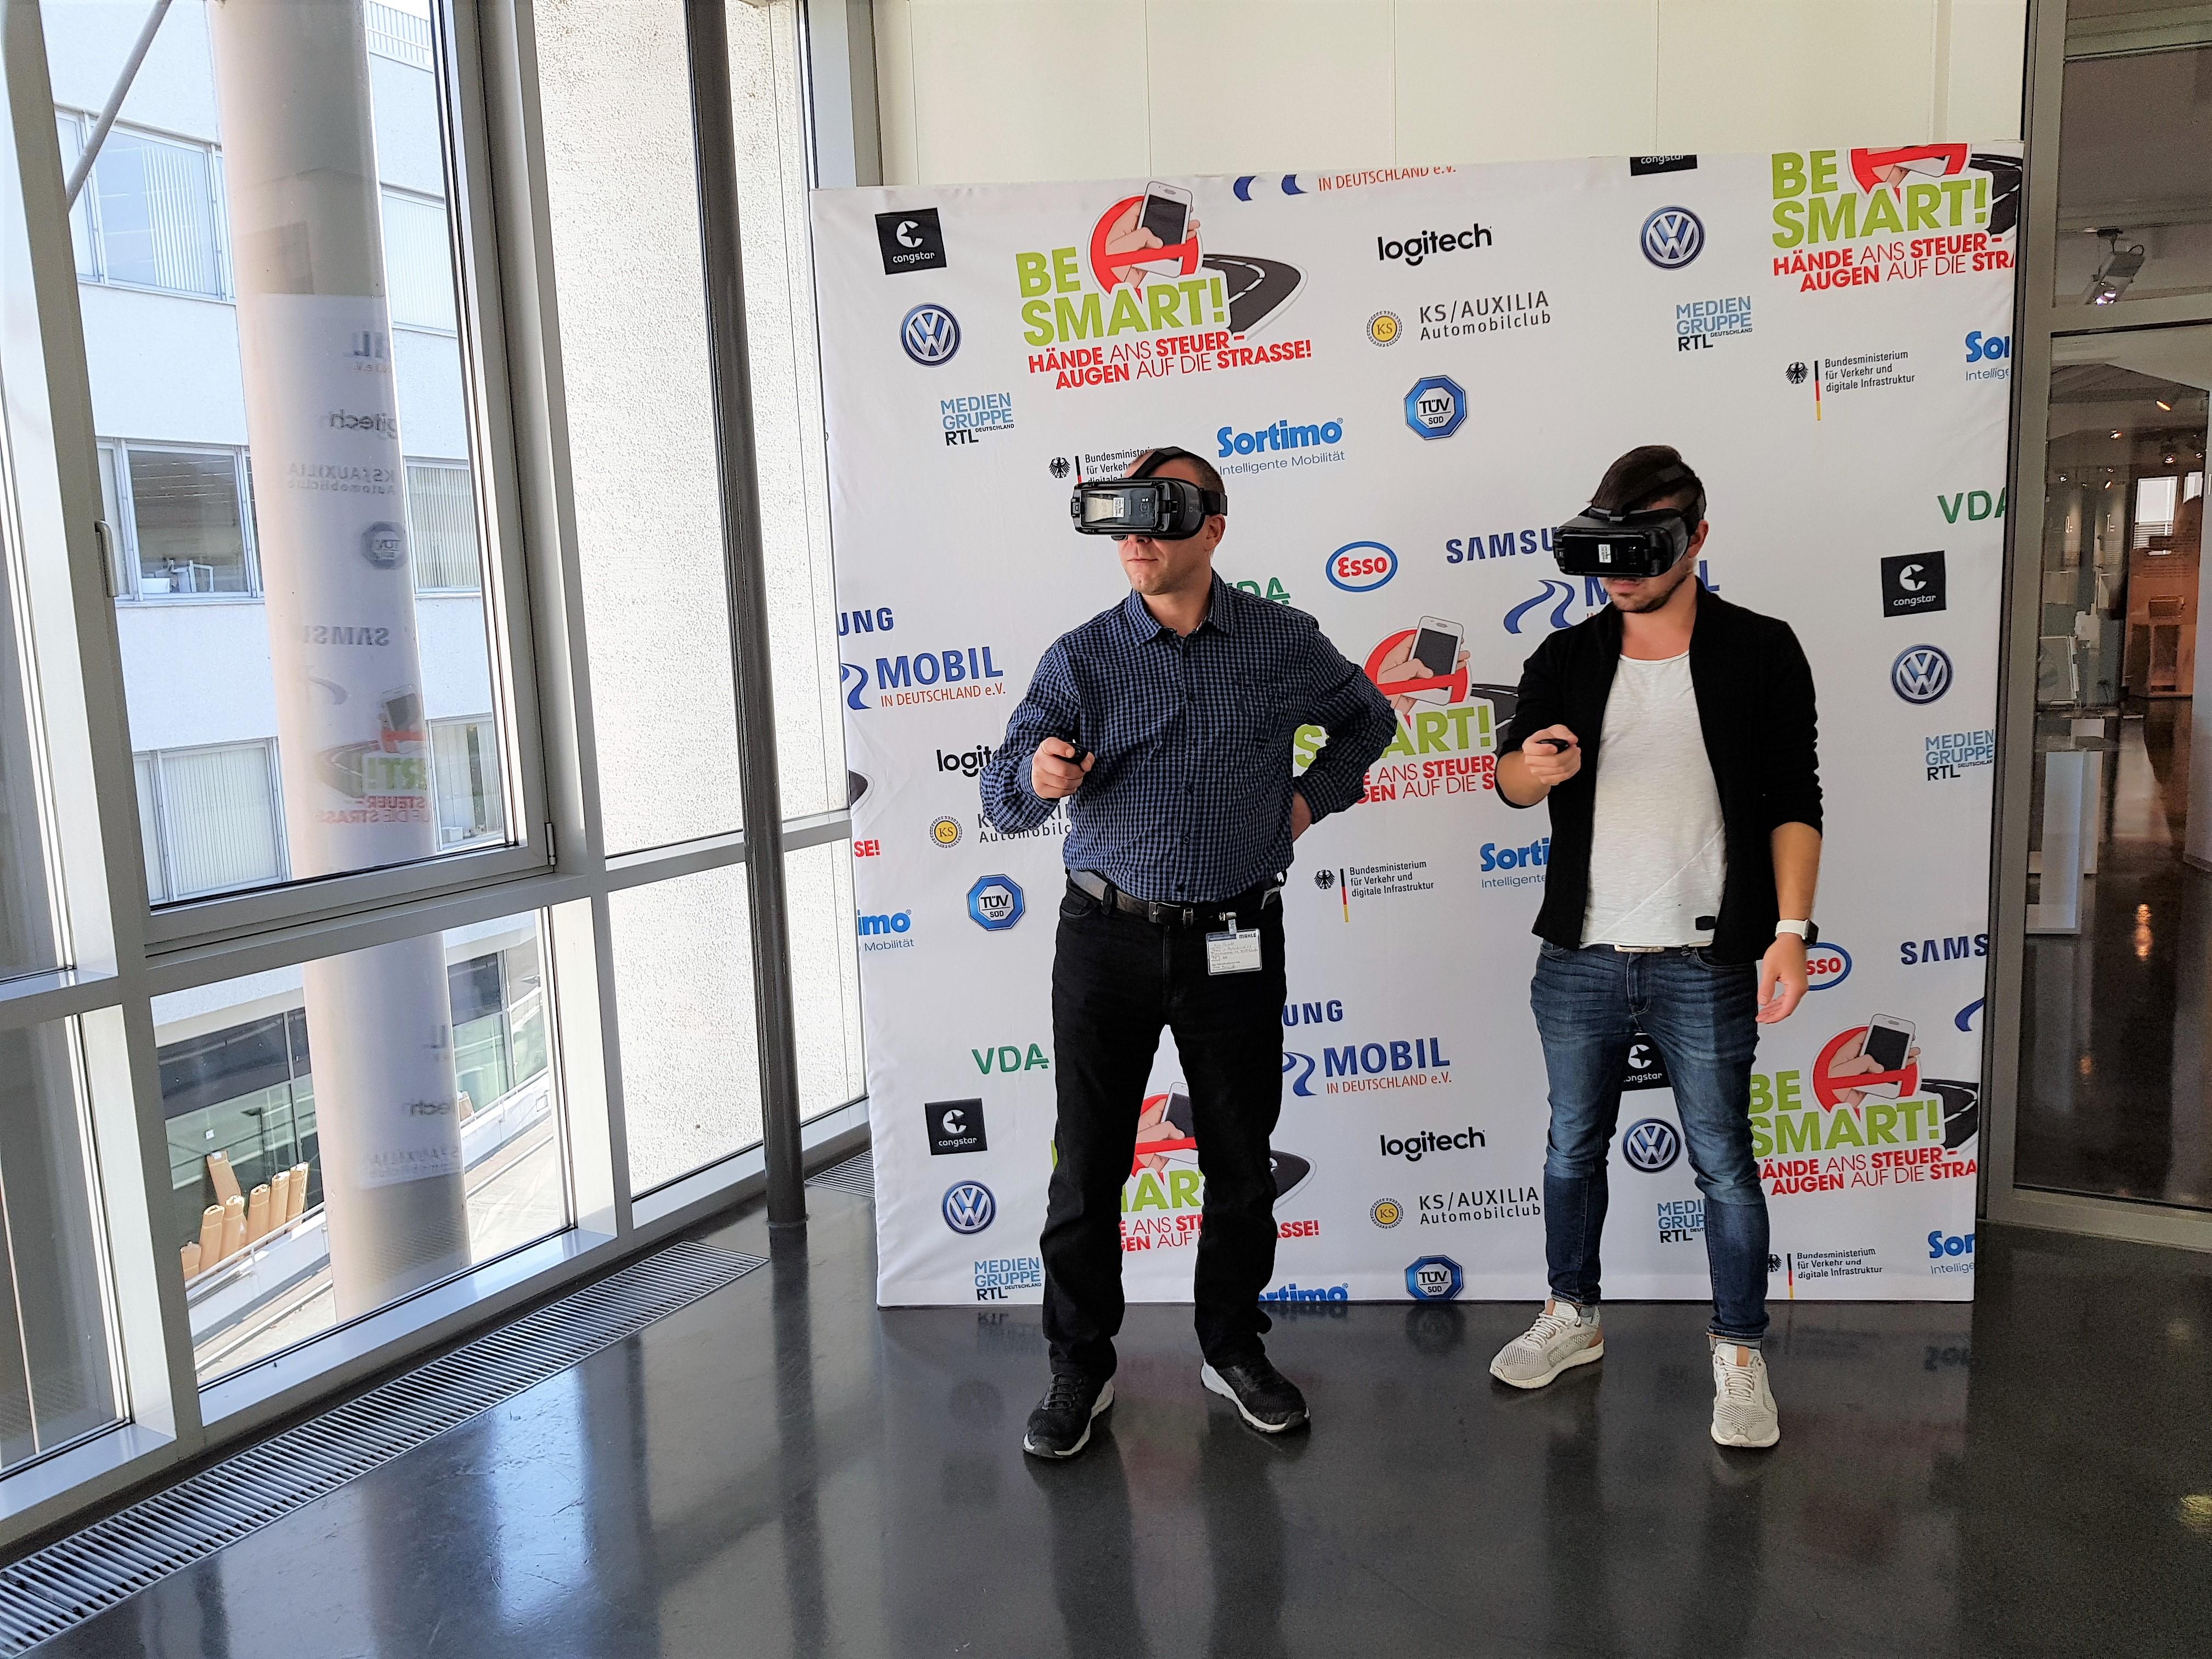 VR Brillen Be Smart